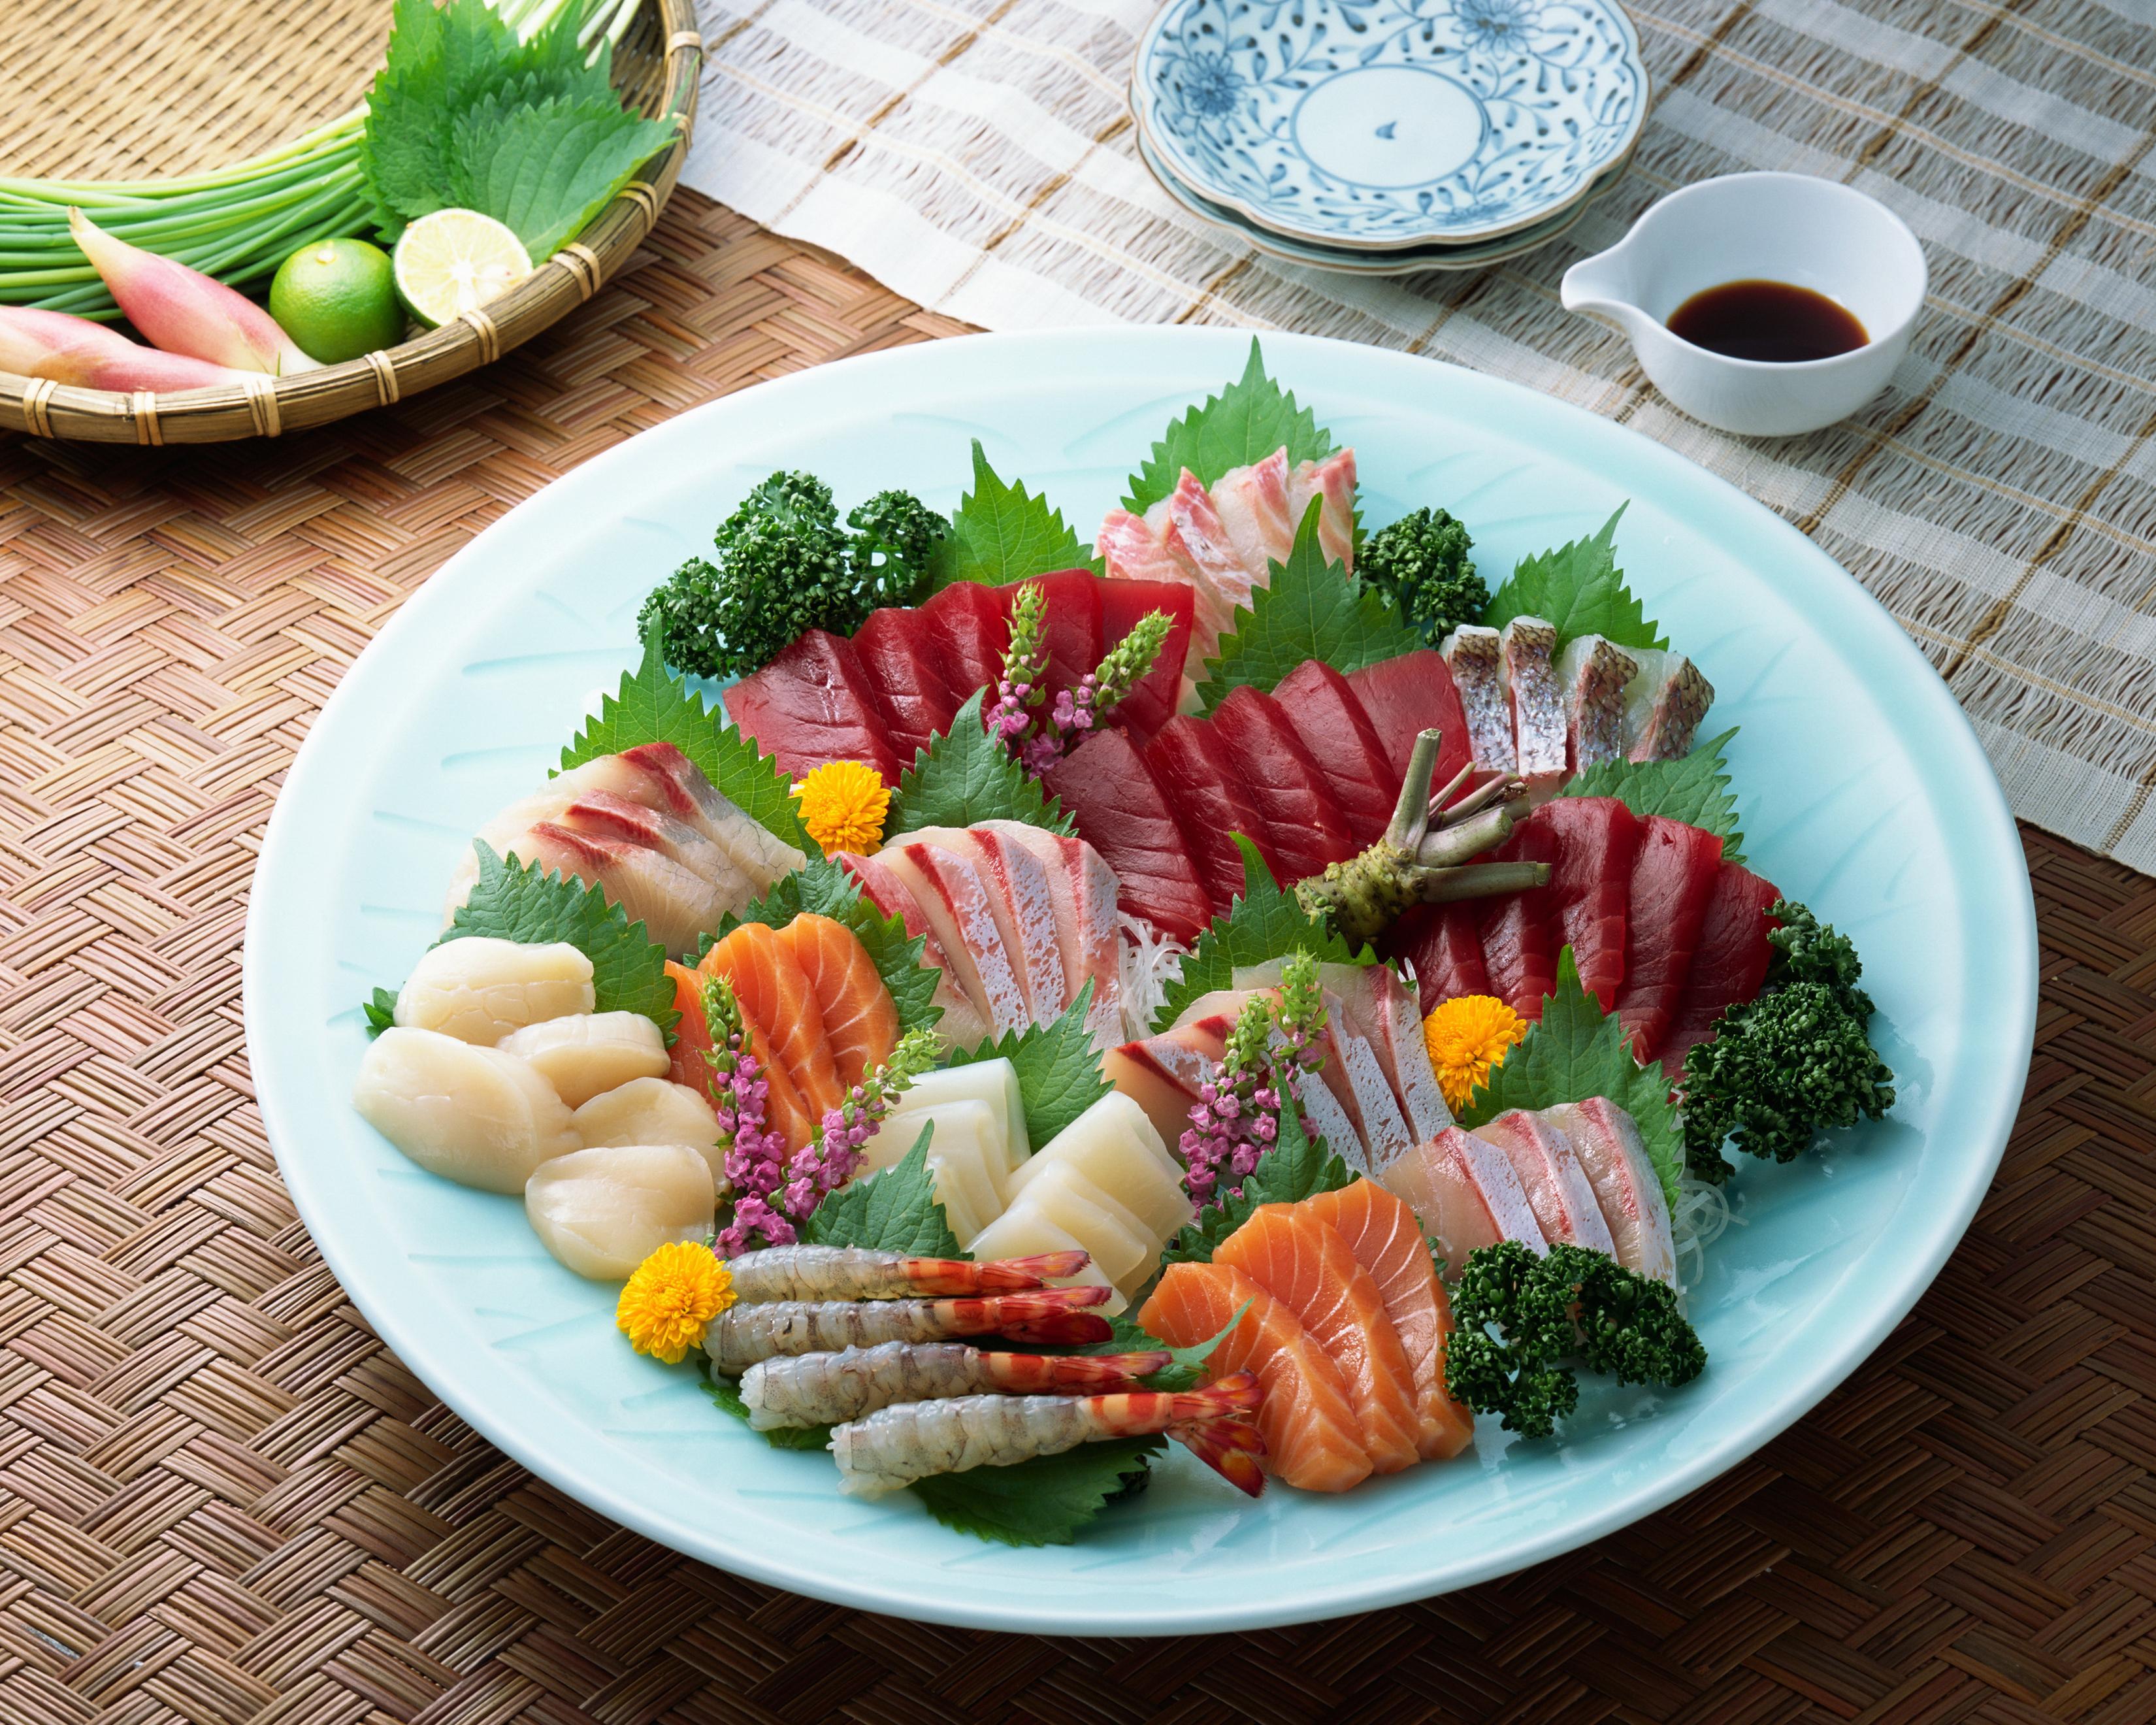 3300x2640、魚介類、魚料理、野菜、皿、食べ物、食品、